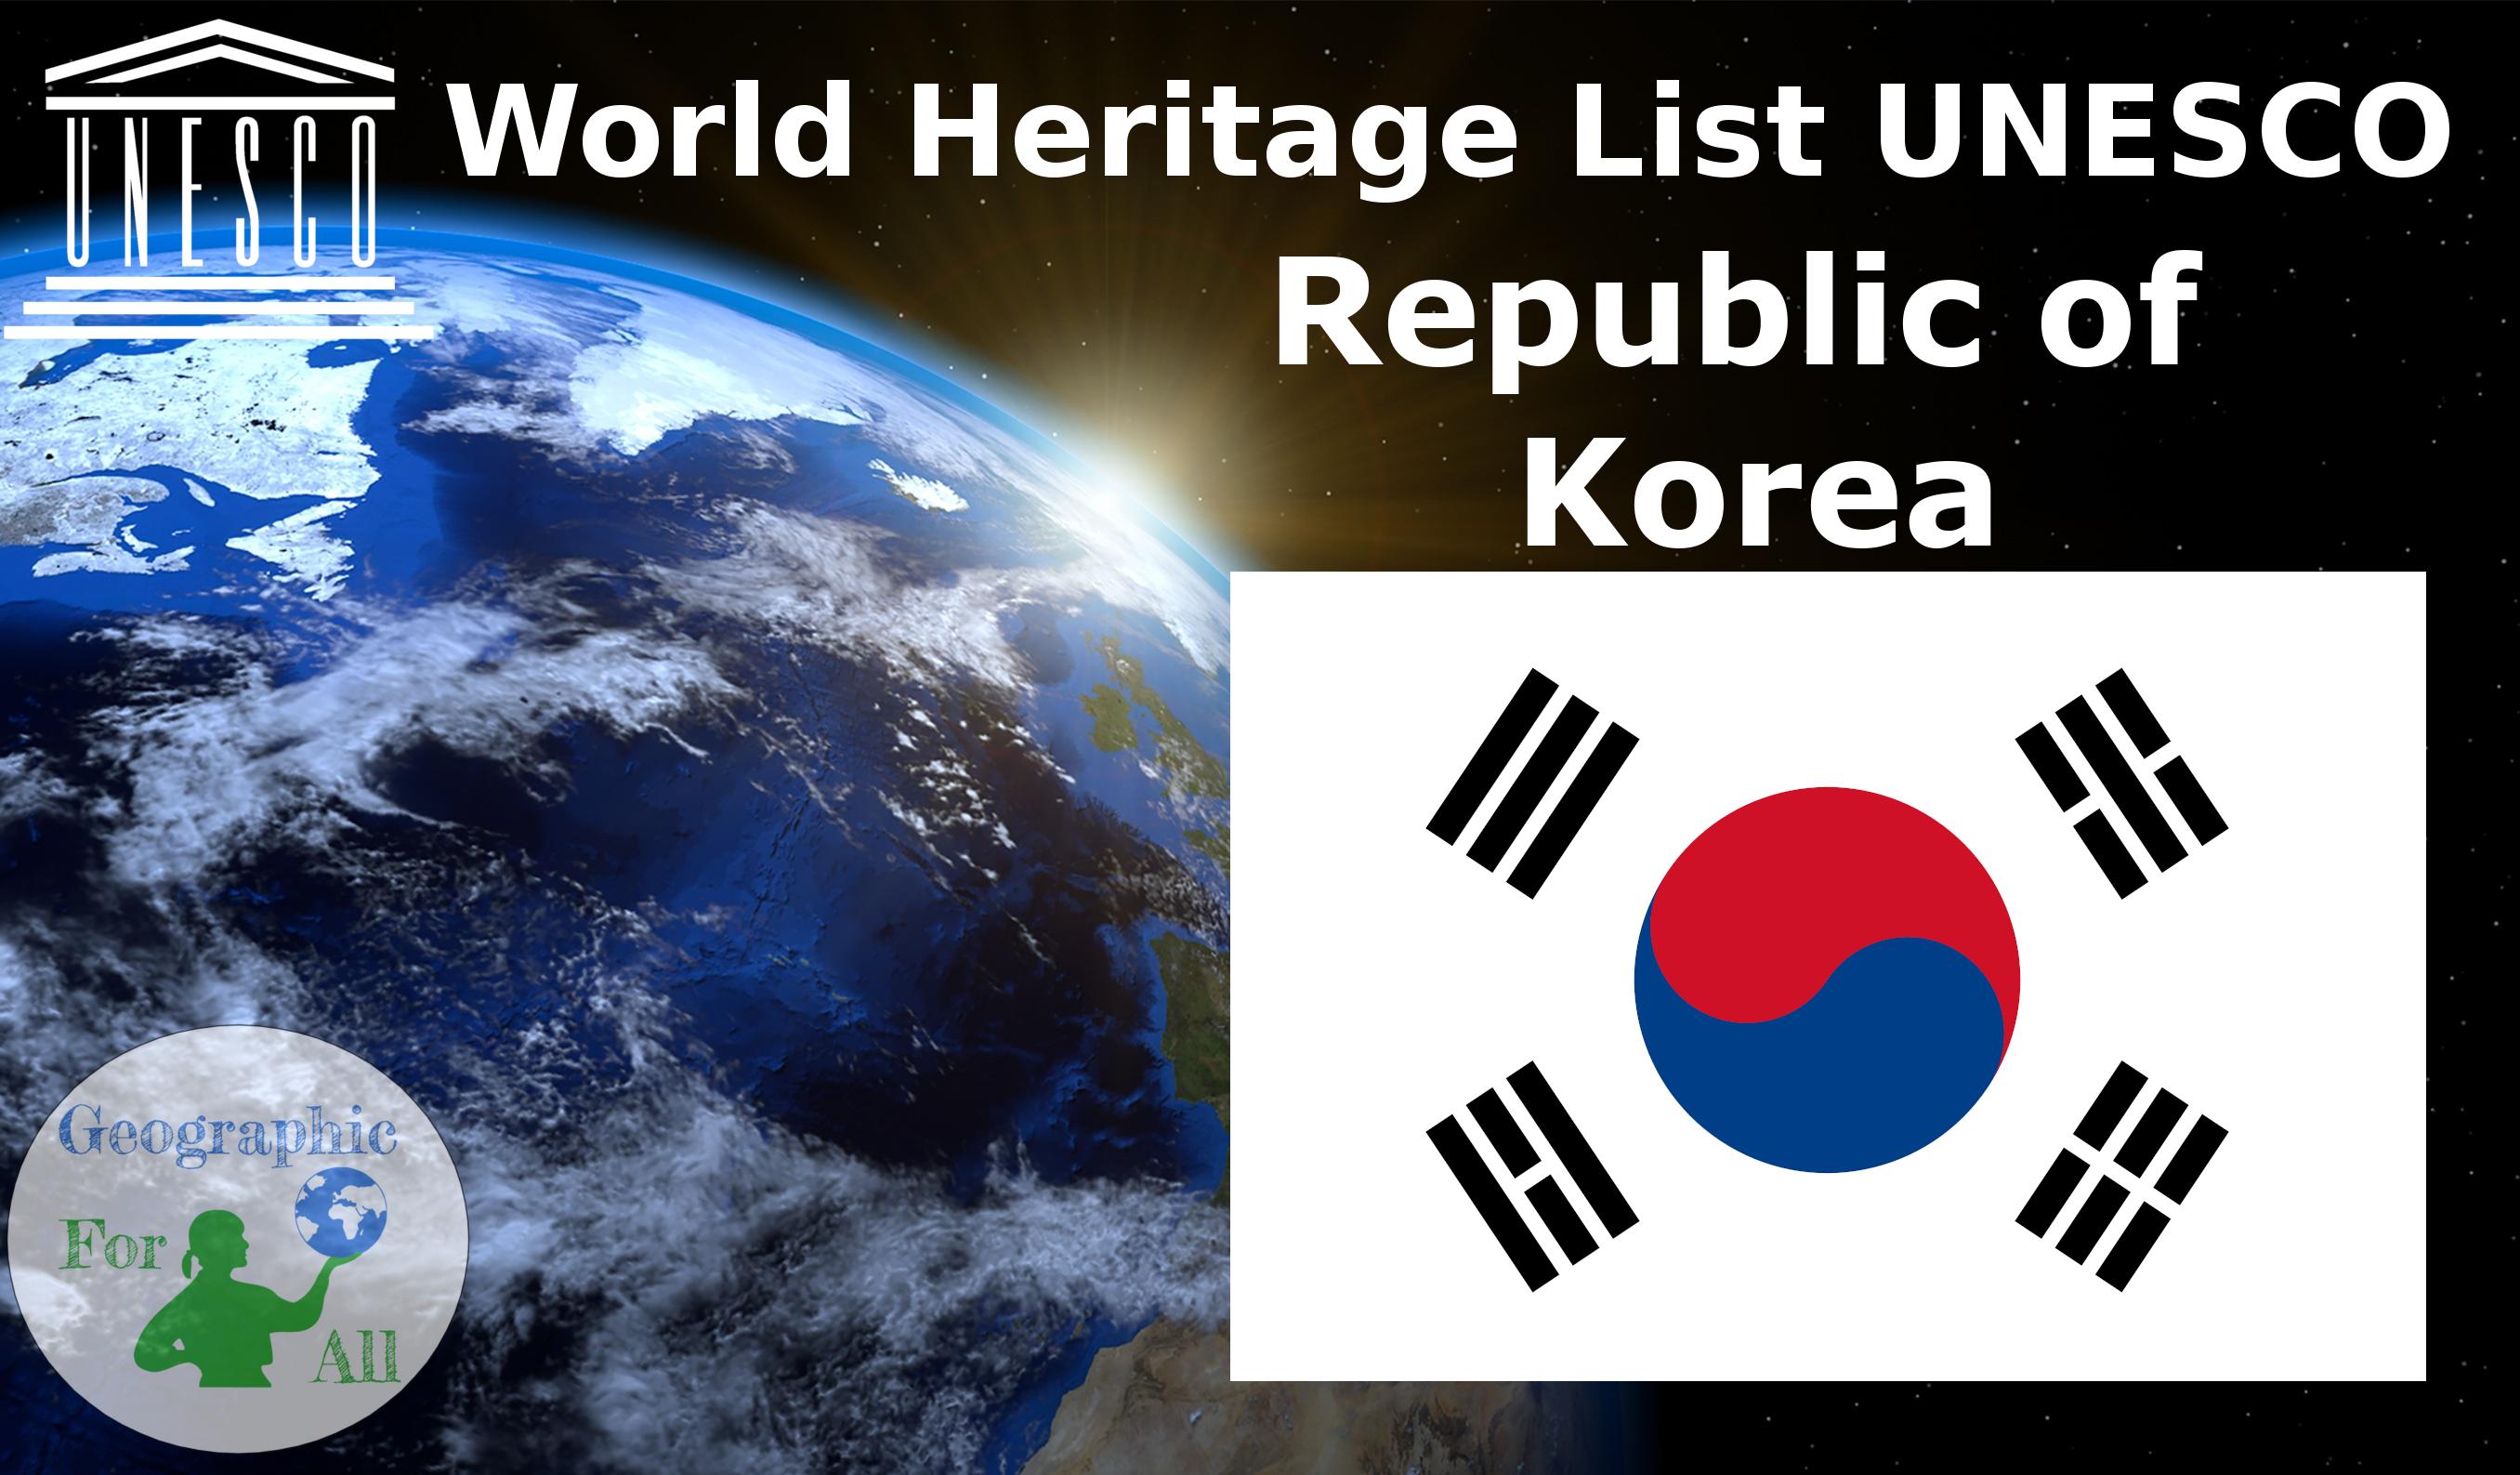 World Heritage List UNESCO - Republic of Korea